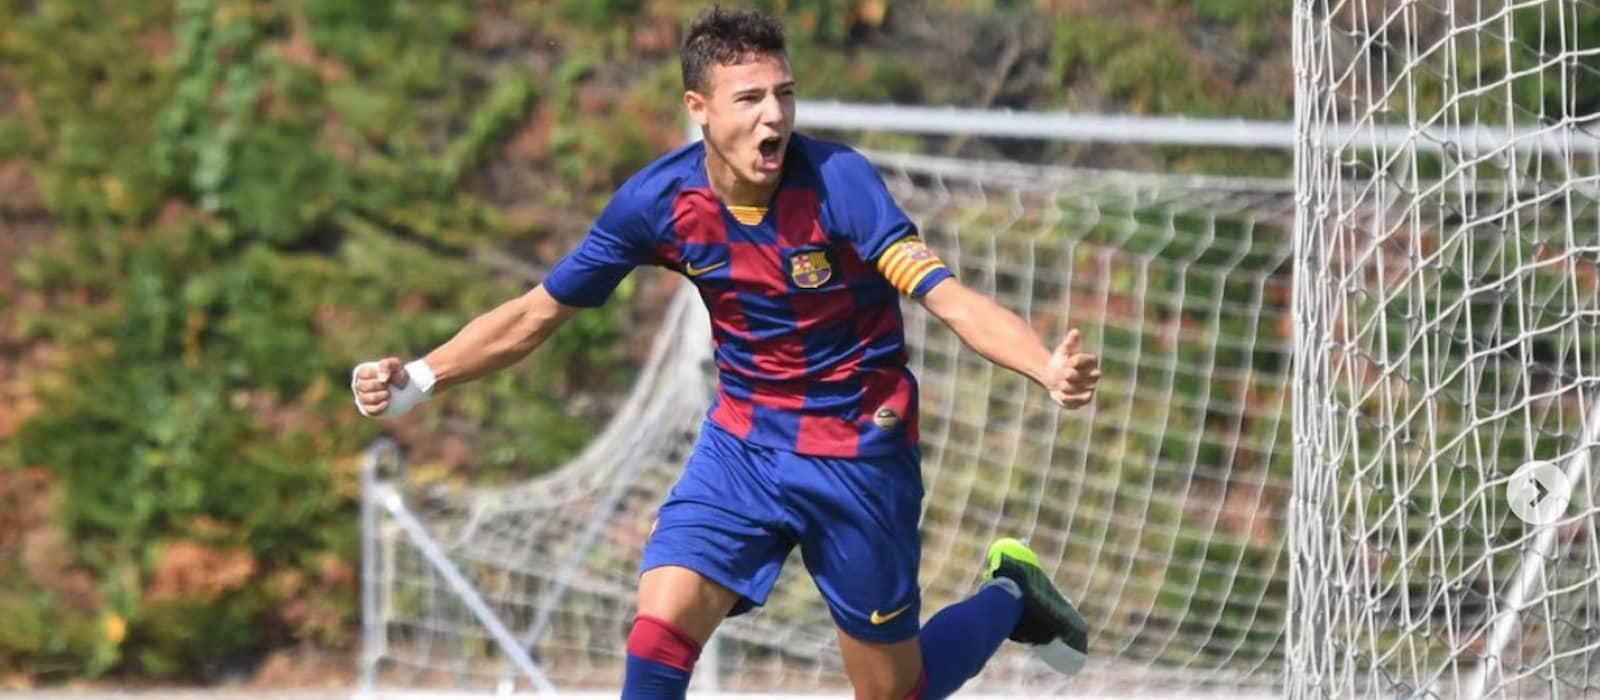 Charlie McNeill and Marc Jurado both score on their Man United U18 debut